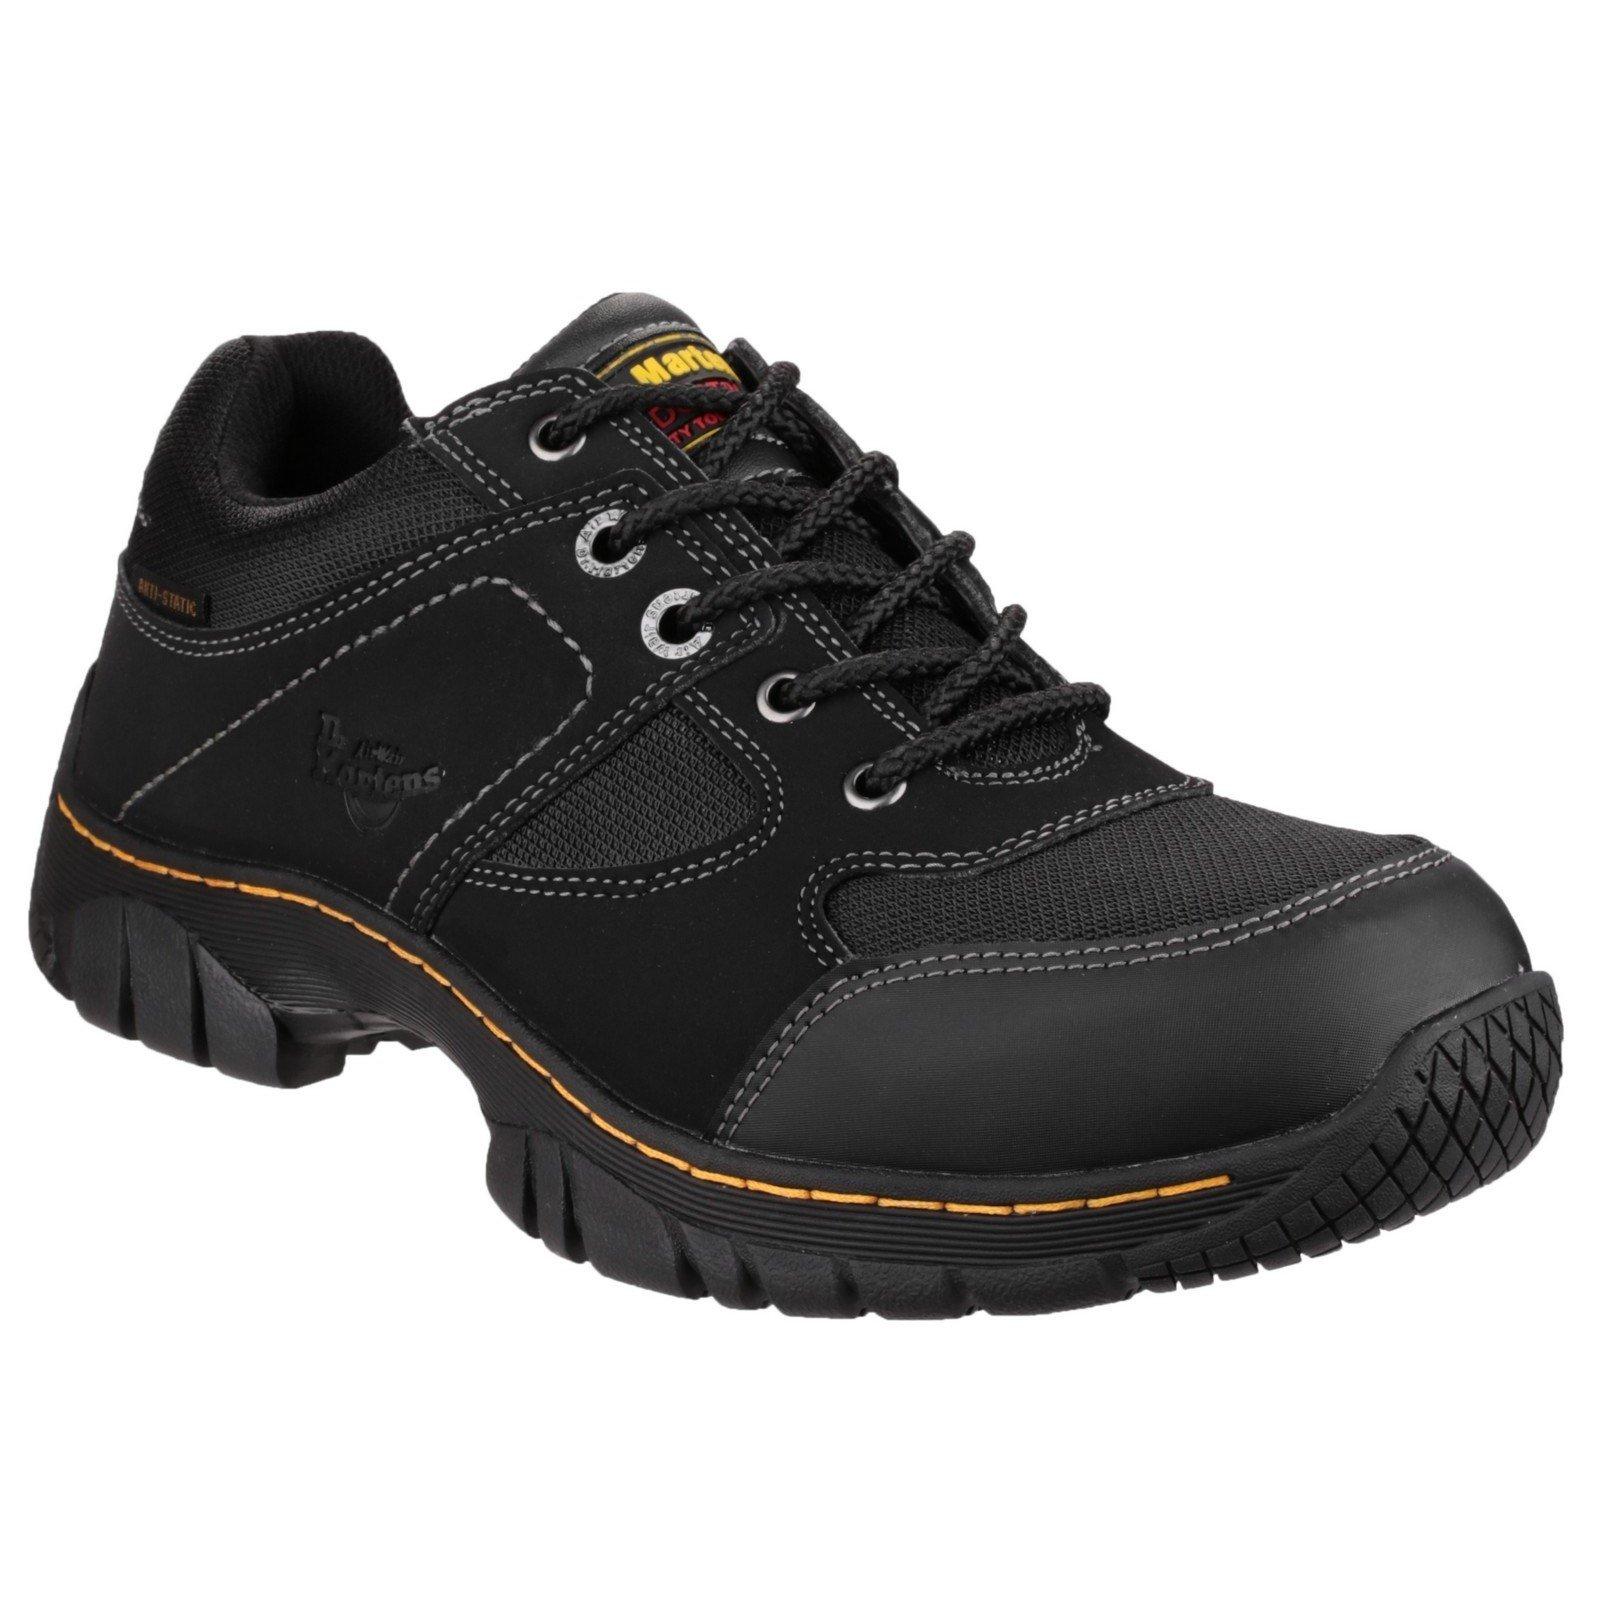 Dr Martens Unisex Gunaldo Safety Trainer Black 21648 - Black 7